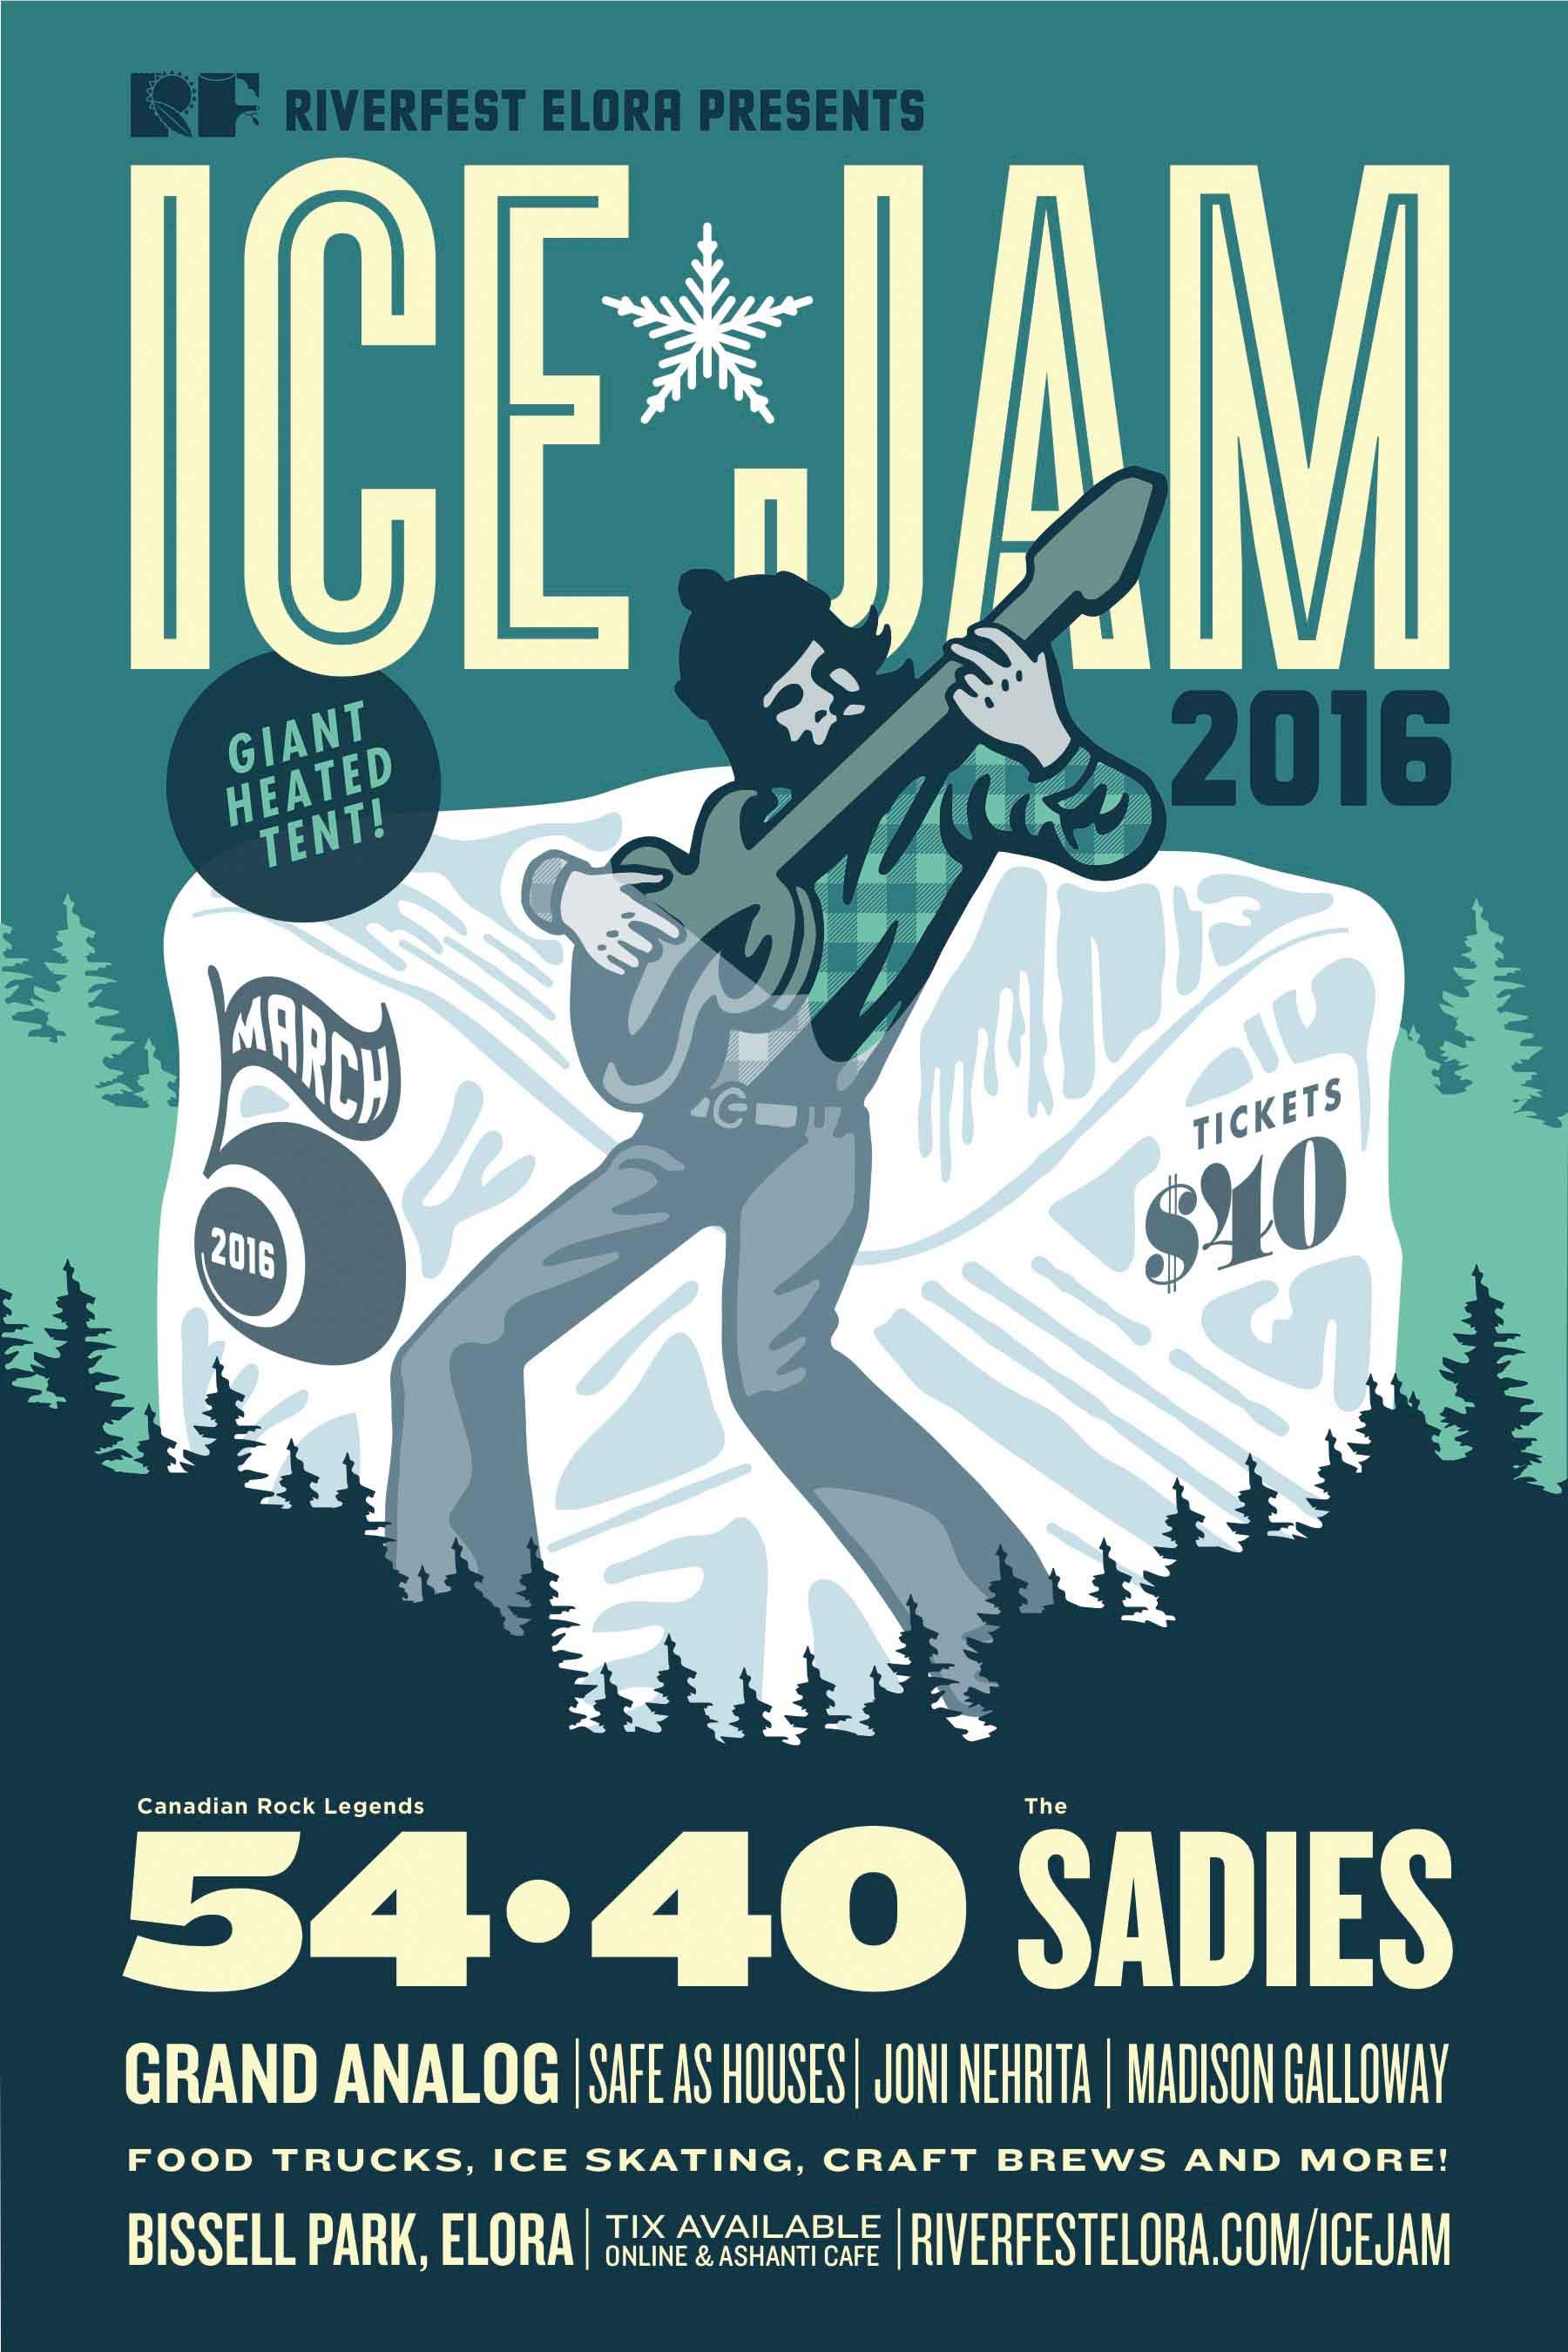 Riverfest Elora's Ice Jam 2016